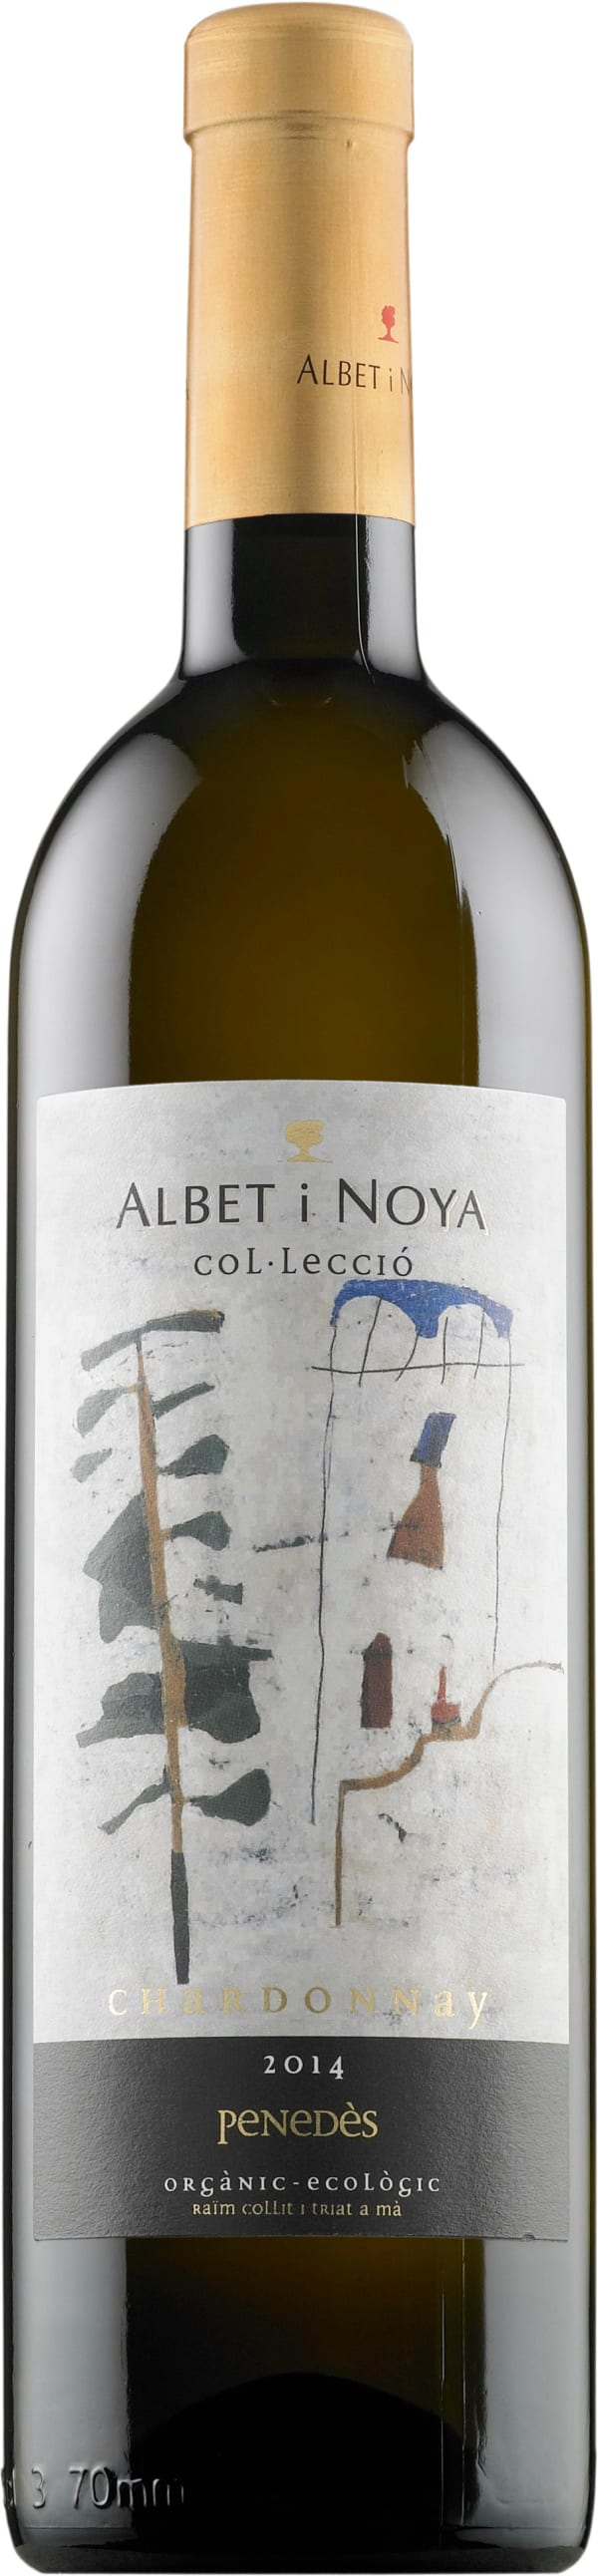 Albet i Noya Collecció Chardonnay